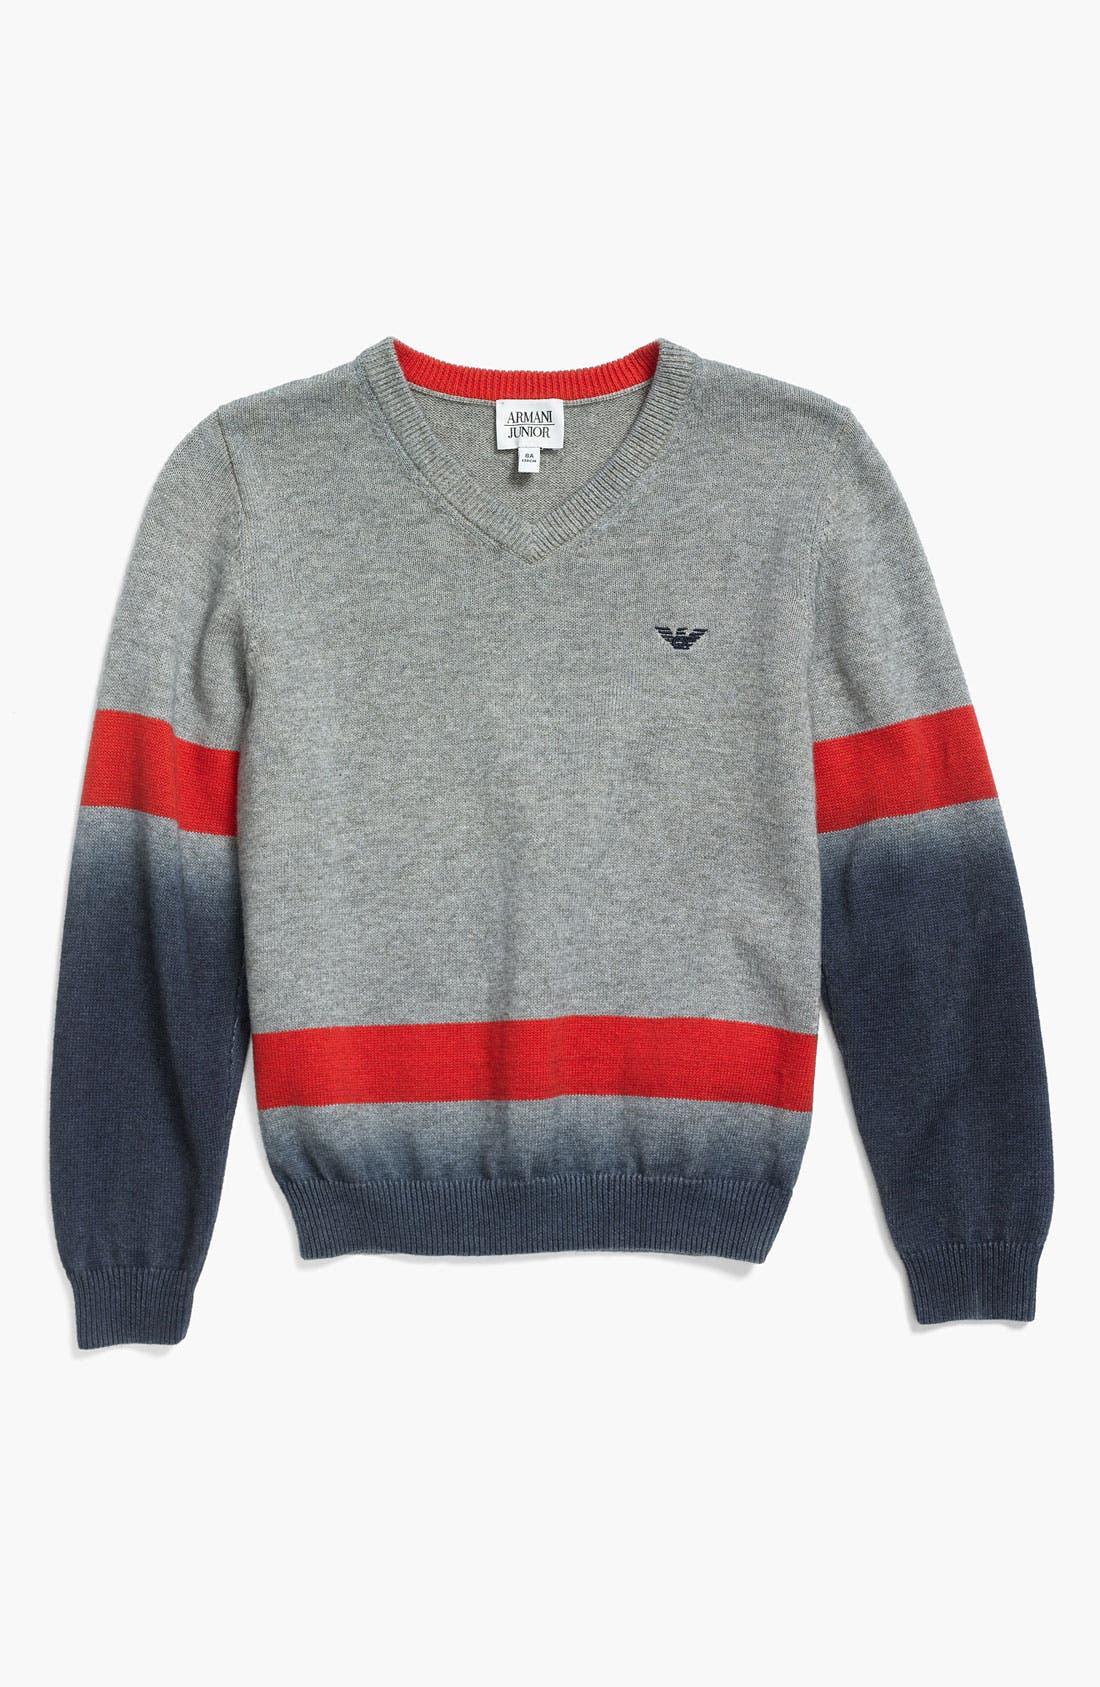 Alternate Image 1 Selected - Armani Junior V-Neck Sweater (Big Boys)